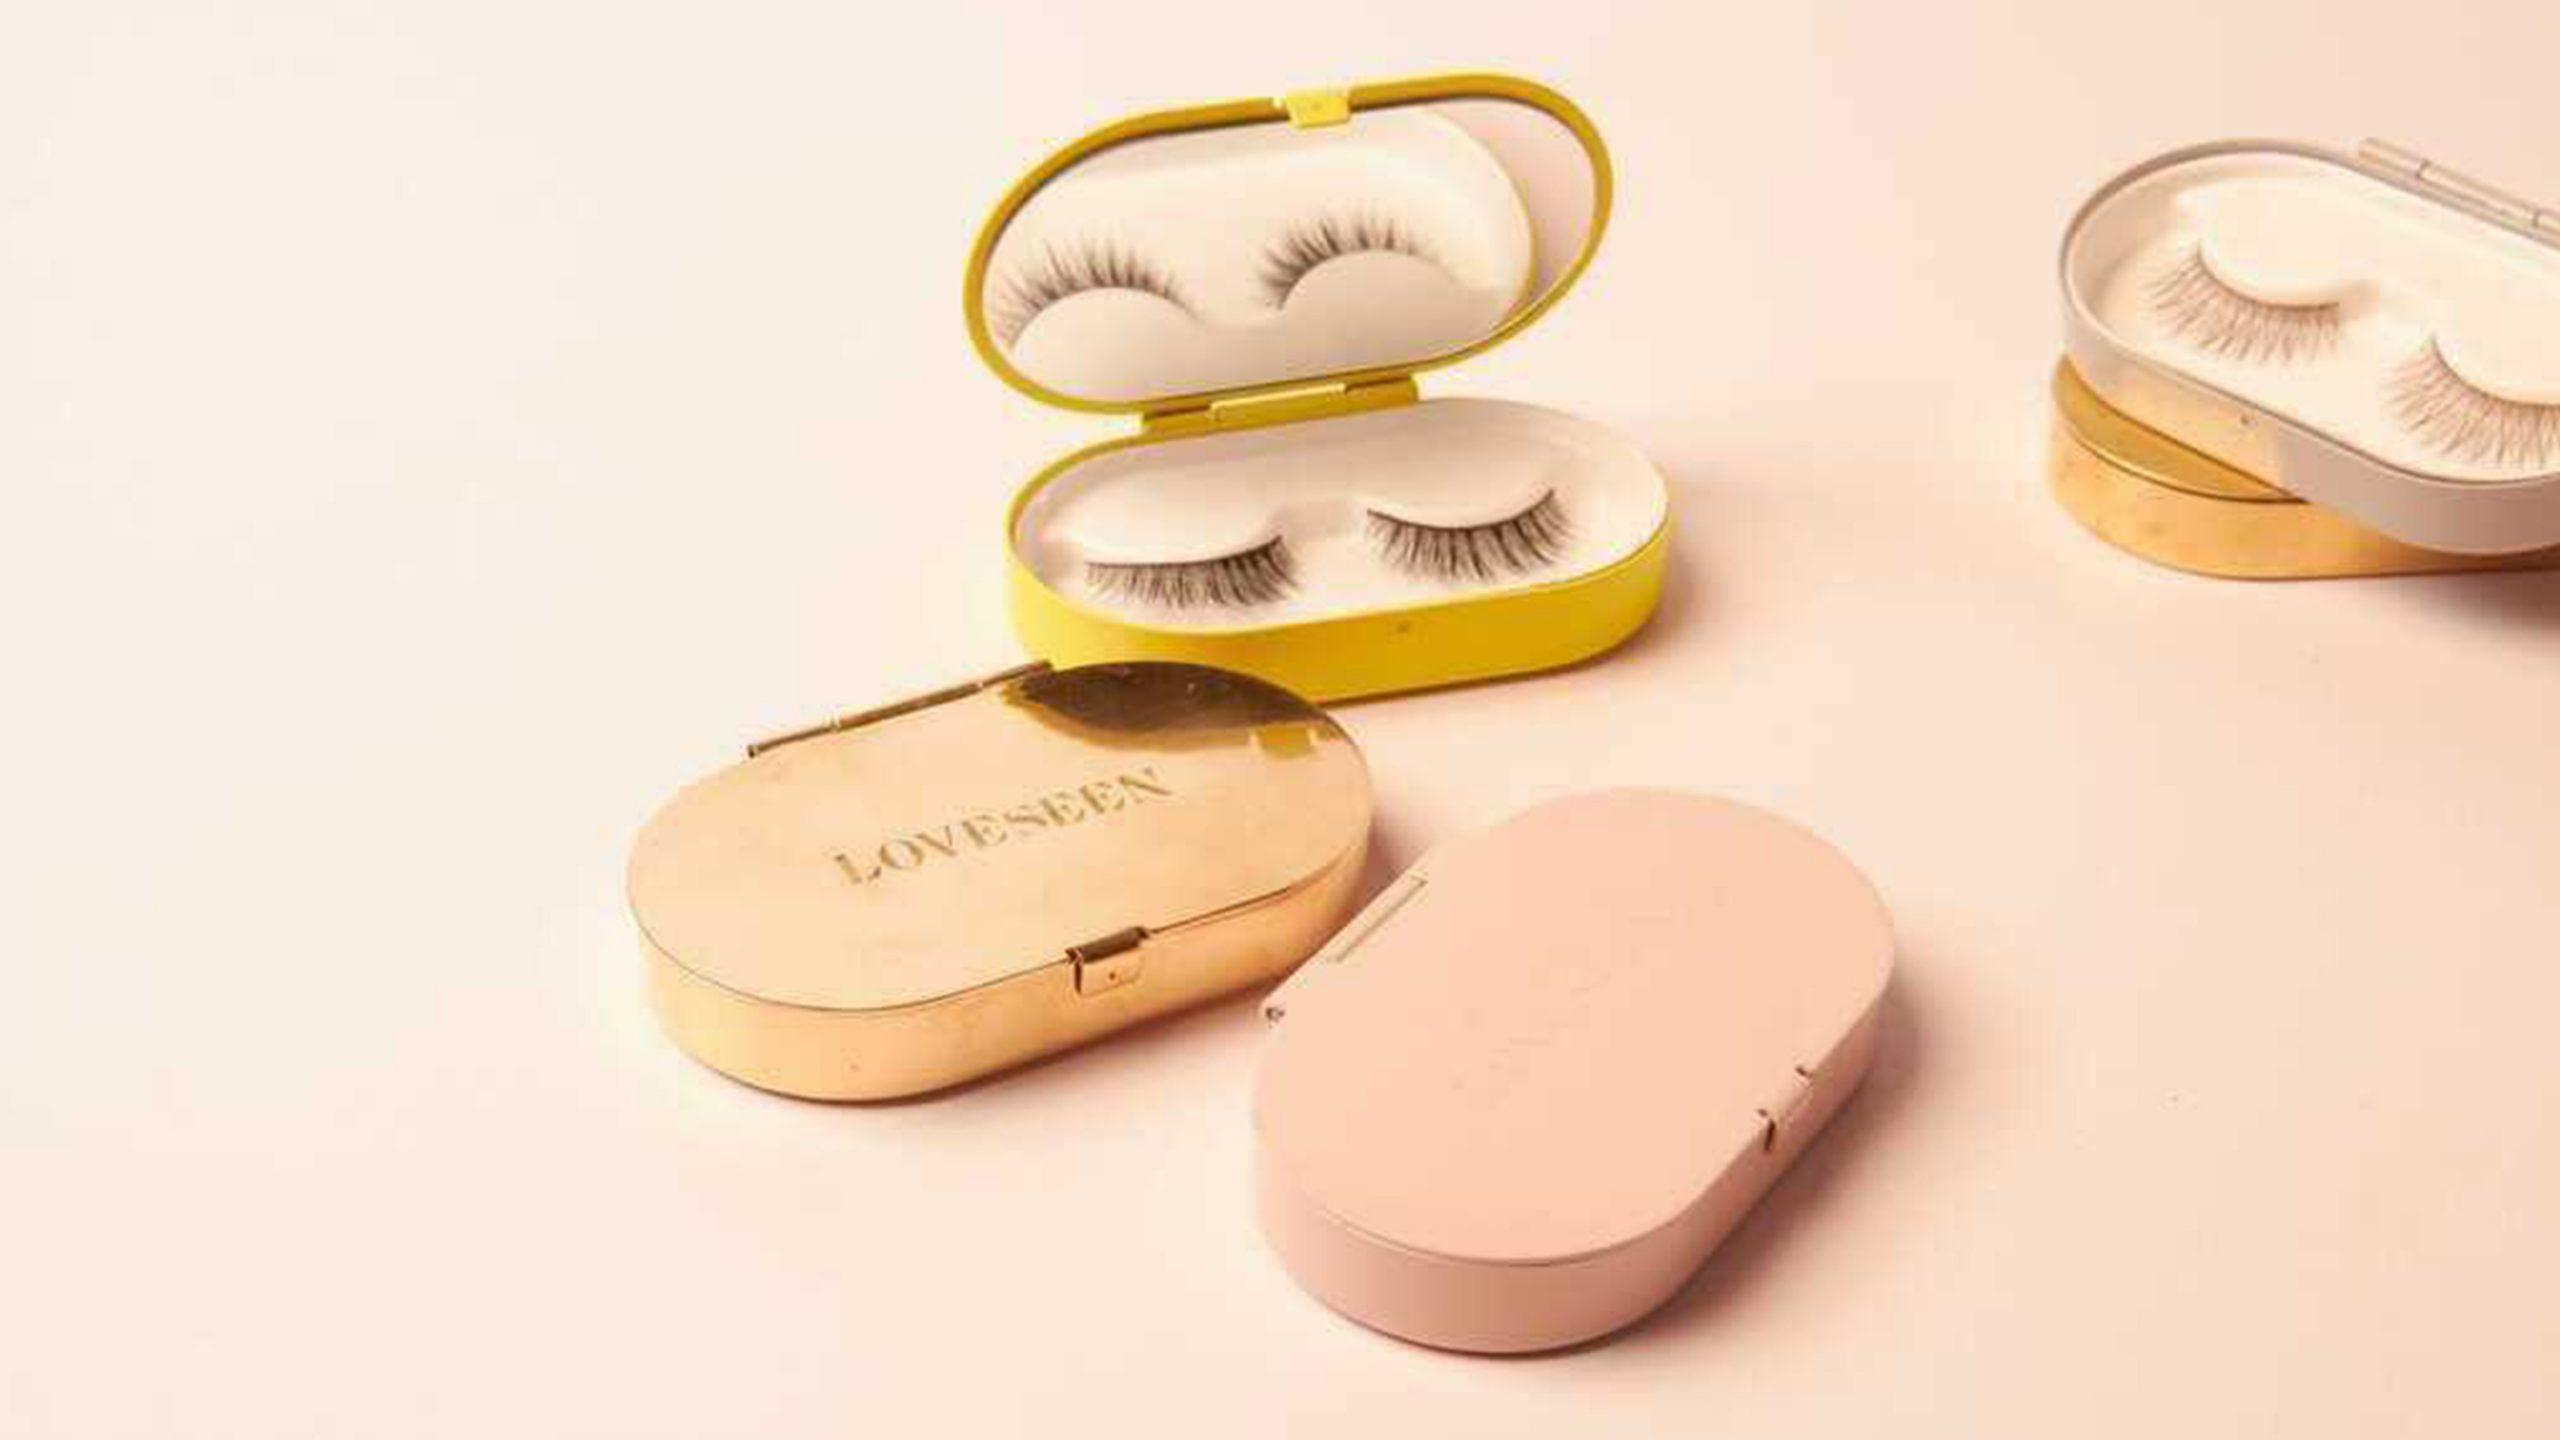 loveseen eyelashes brand